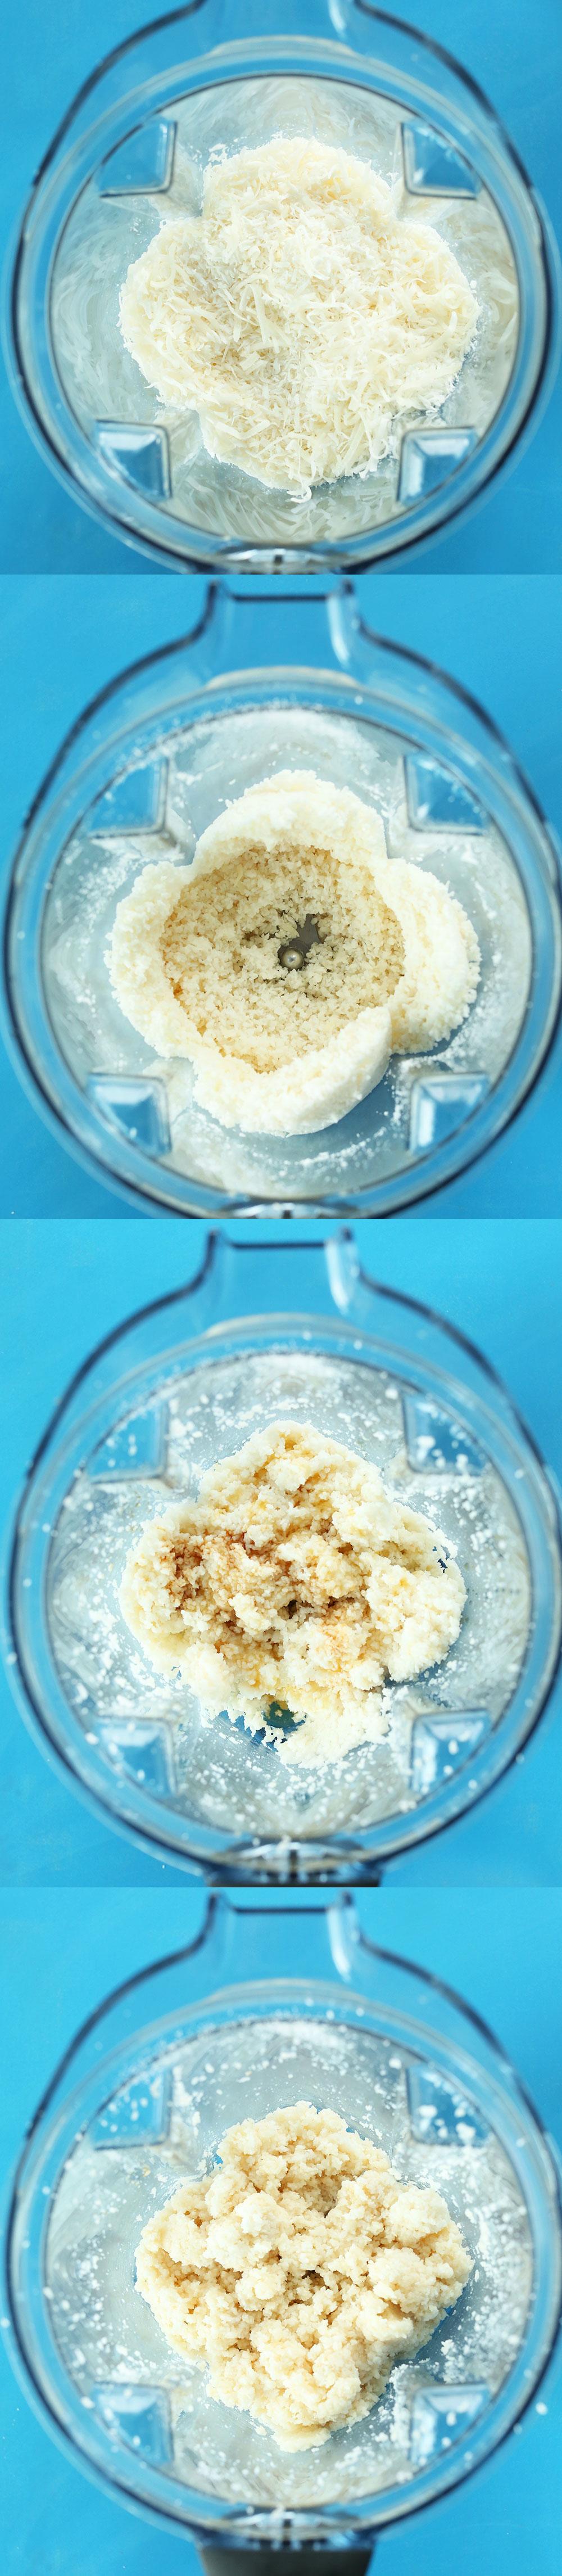 How to Make Vegan Coconut MACAROONS! #vegan #glutenfree #minimalistbaker